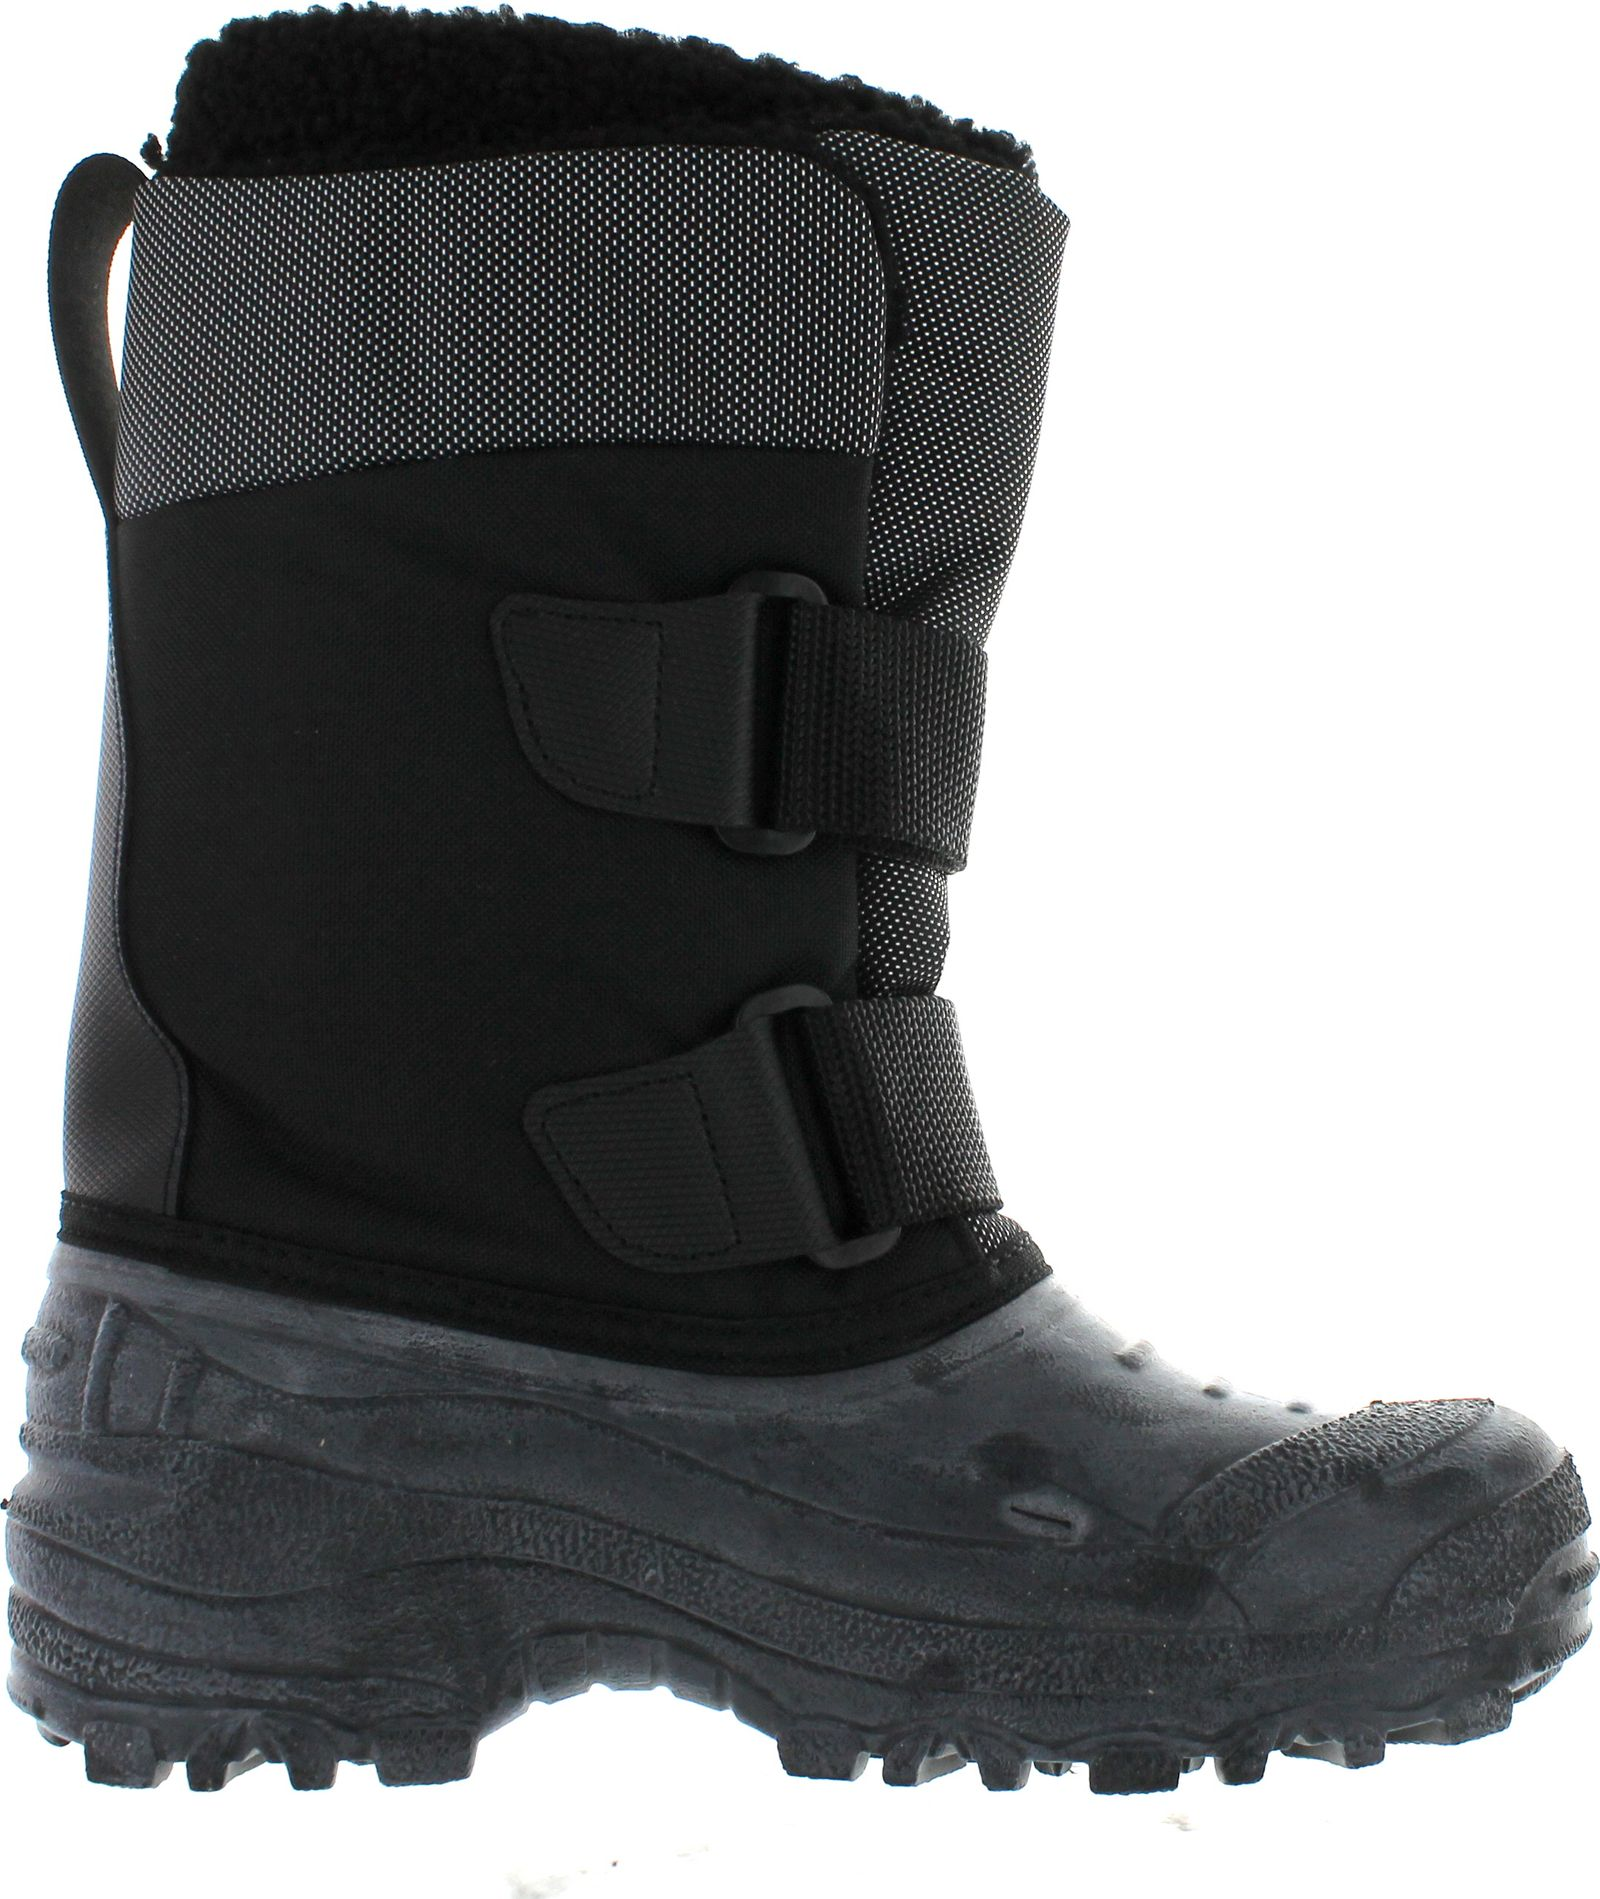 tundra boys plateau tall waterproof snow boots. Black Bedroom Furniture Sets. Home Design Ideas